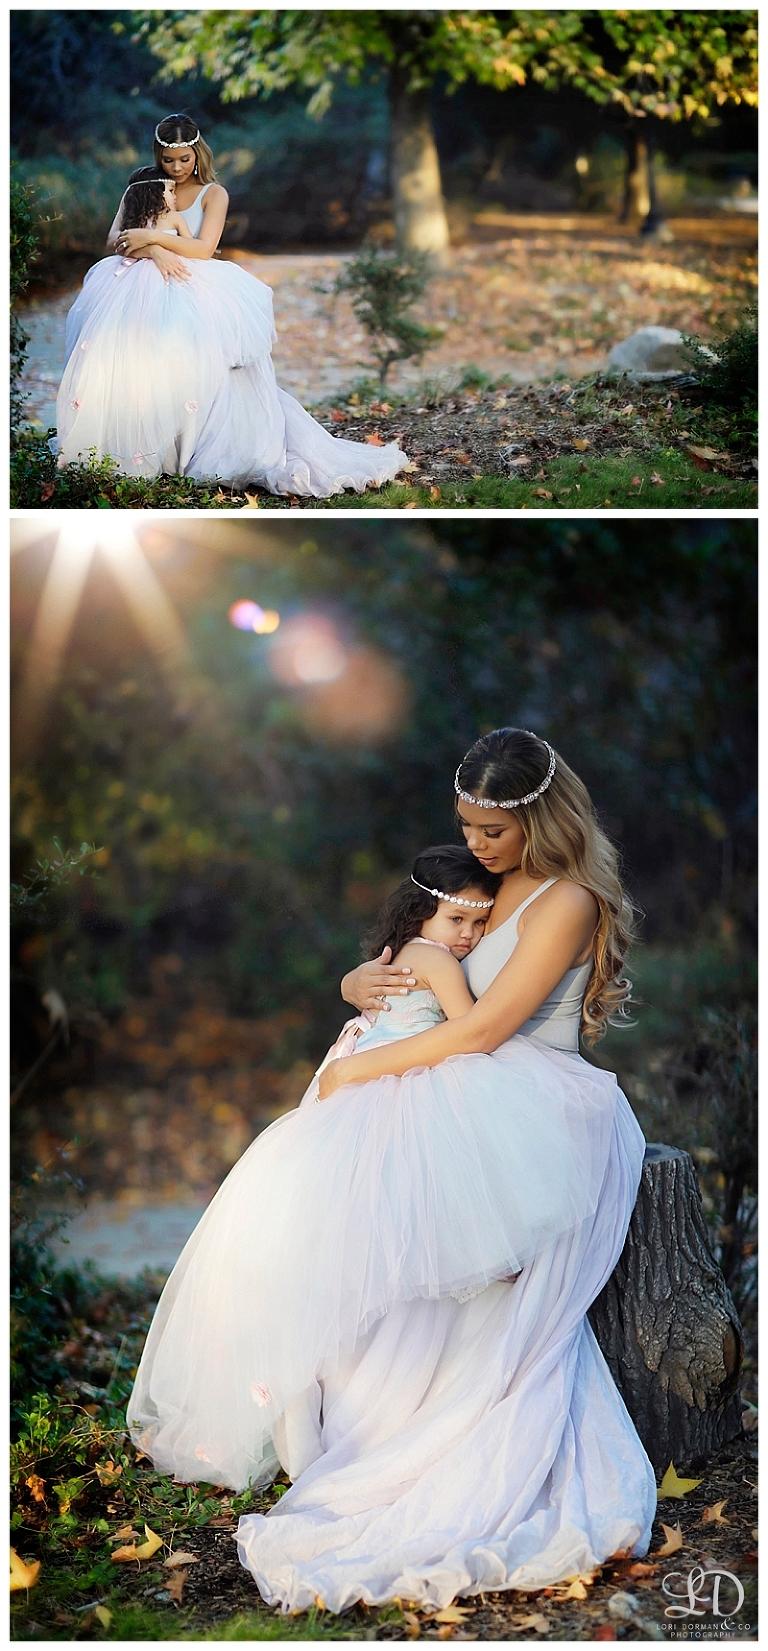 sweet maternity photoshoot-lori dorman photography-maternity boudoir-professional photographer_4287.jpg